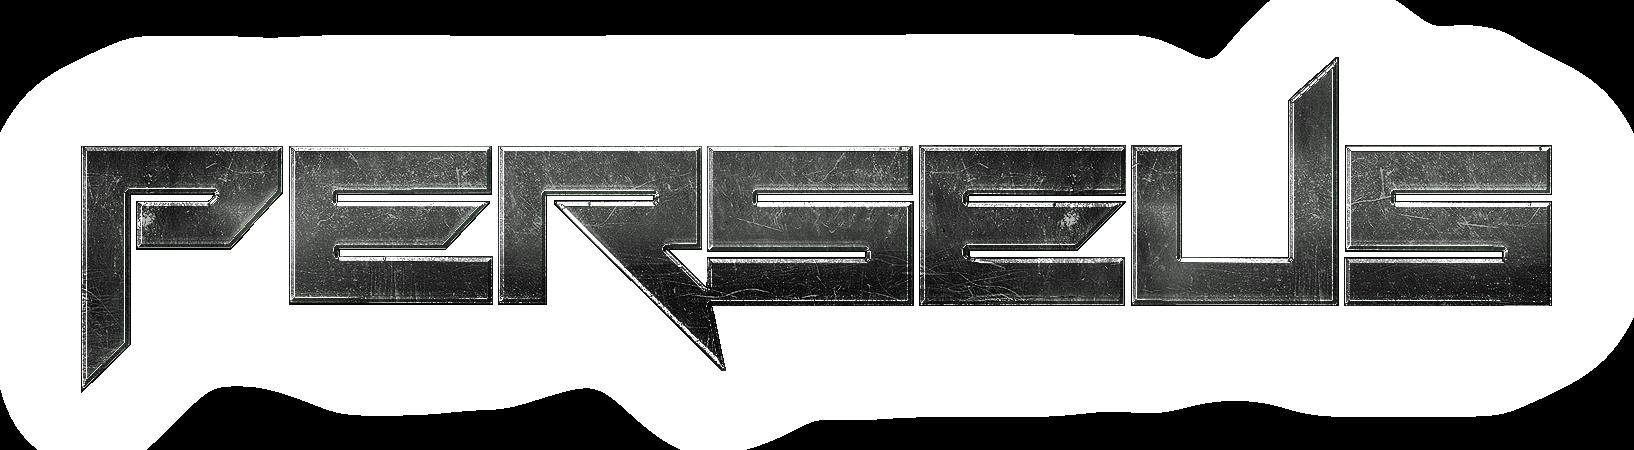 logo-perseus